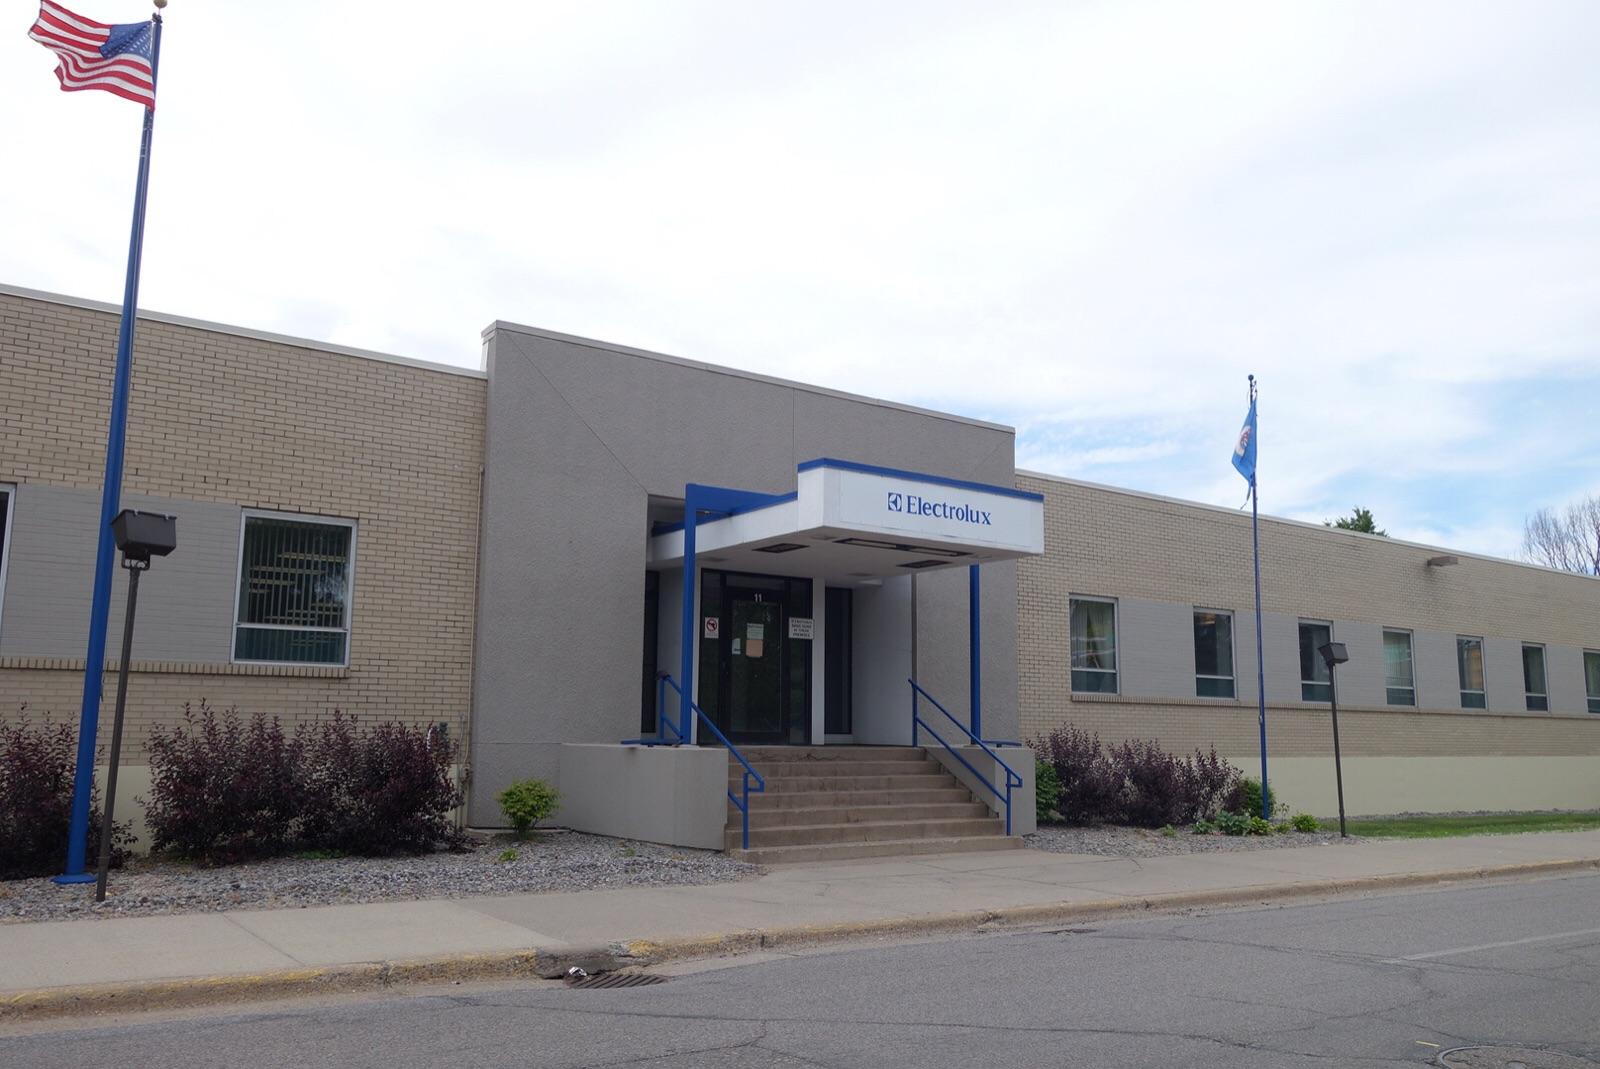 Electrolux plant in St. Cloud, Minnesota.